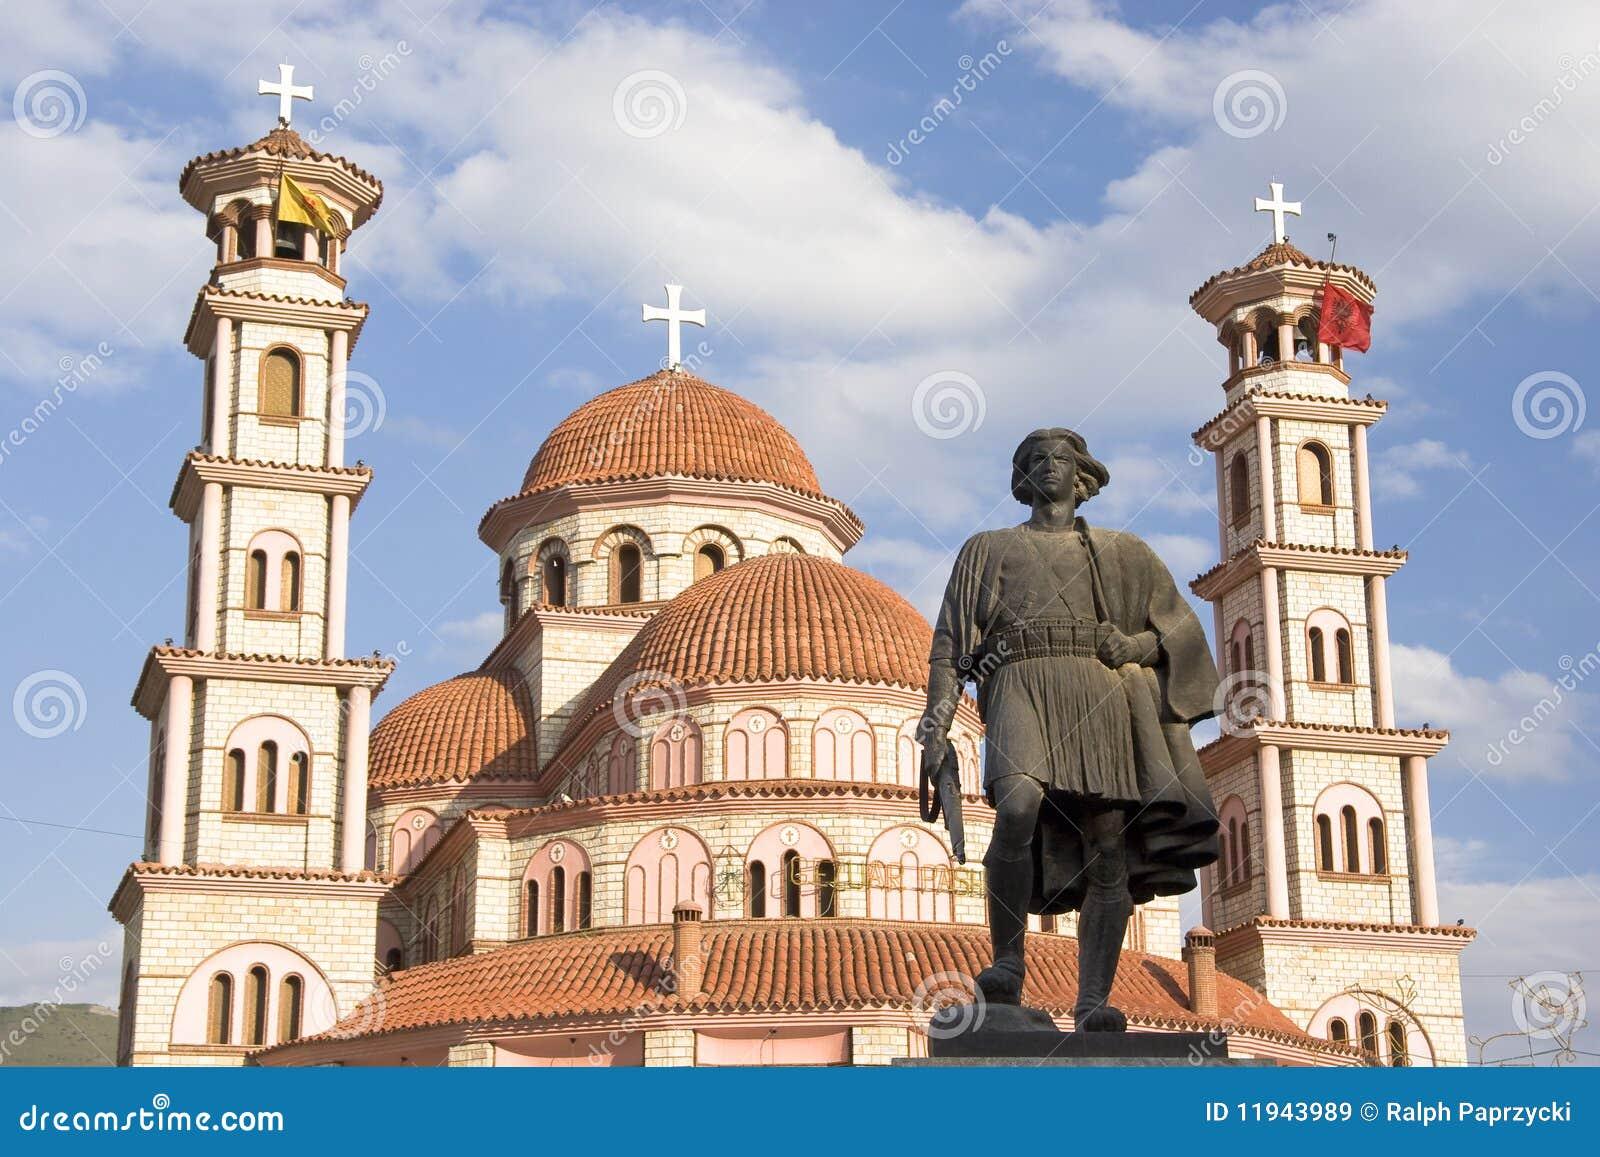 Statue and orthodox church, Korca, Albania